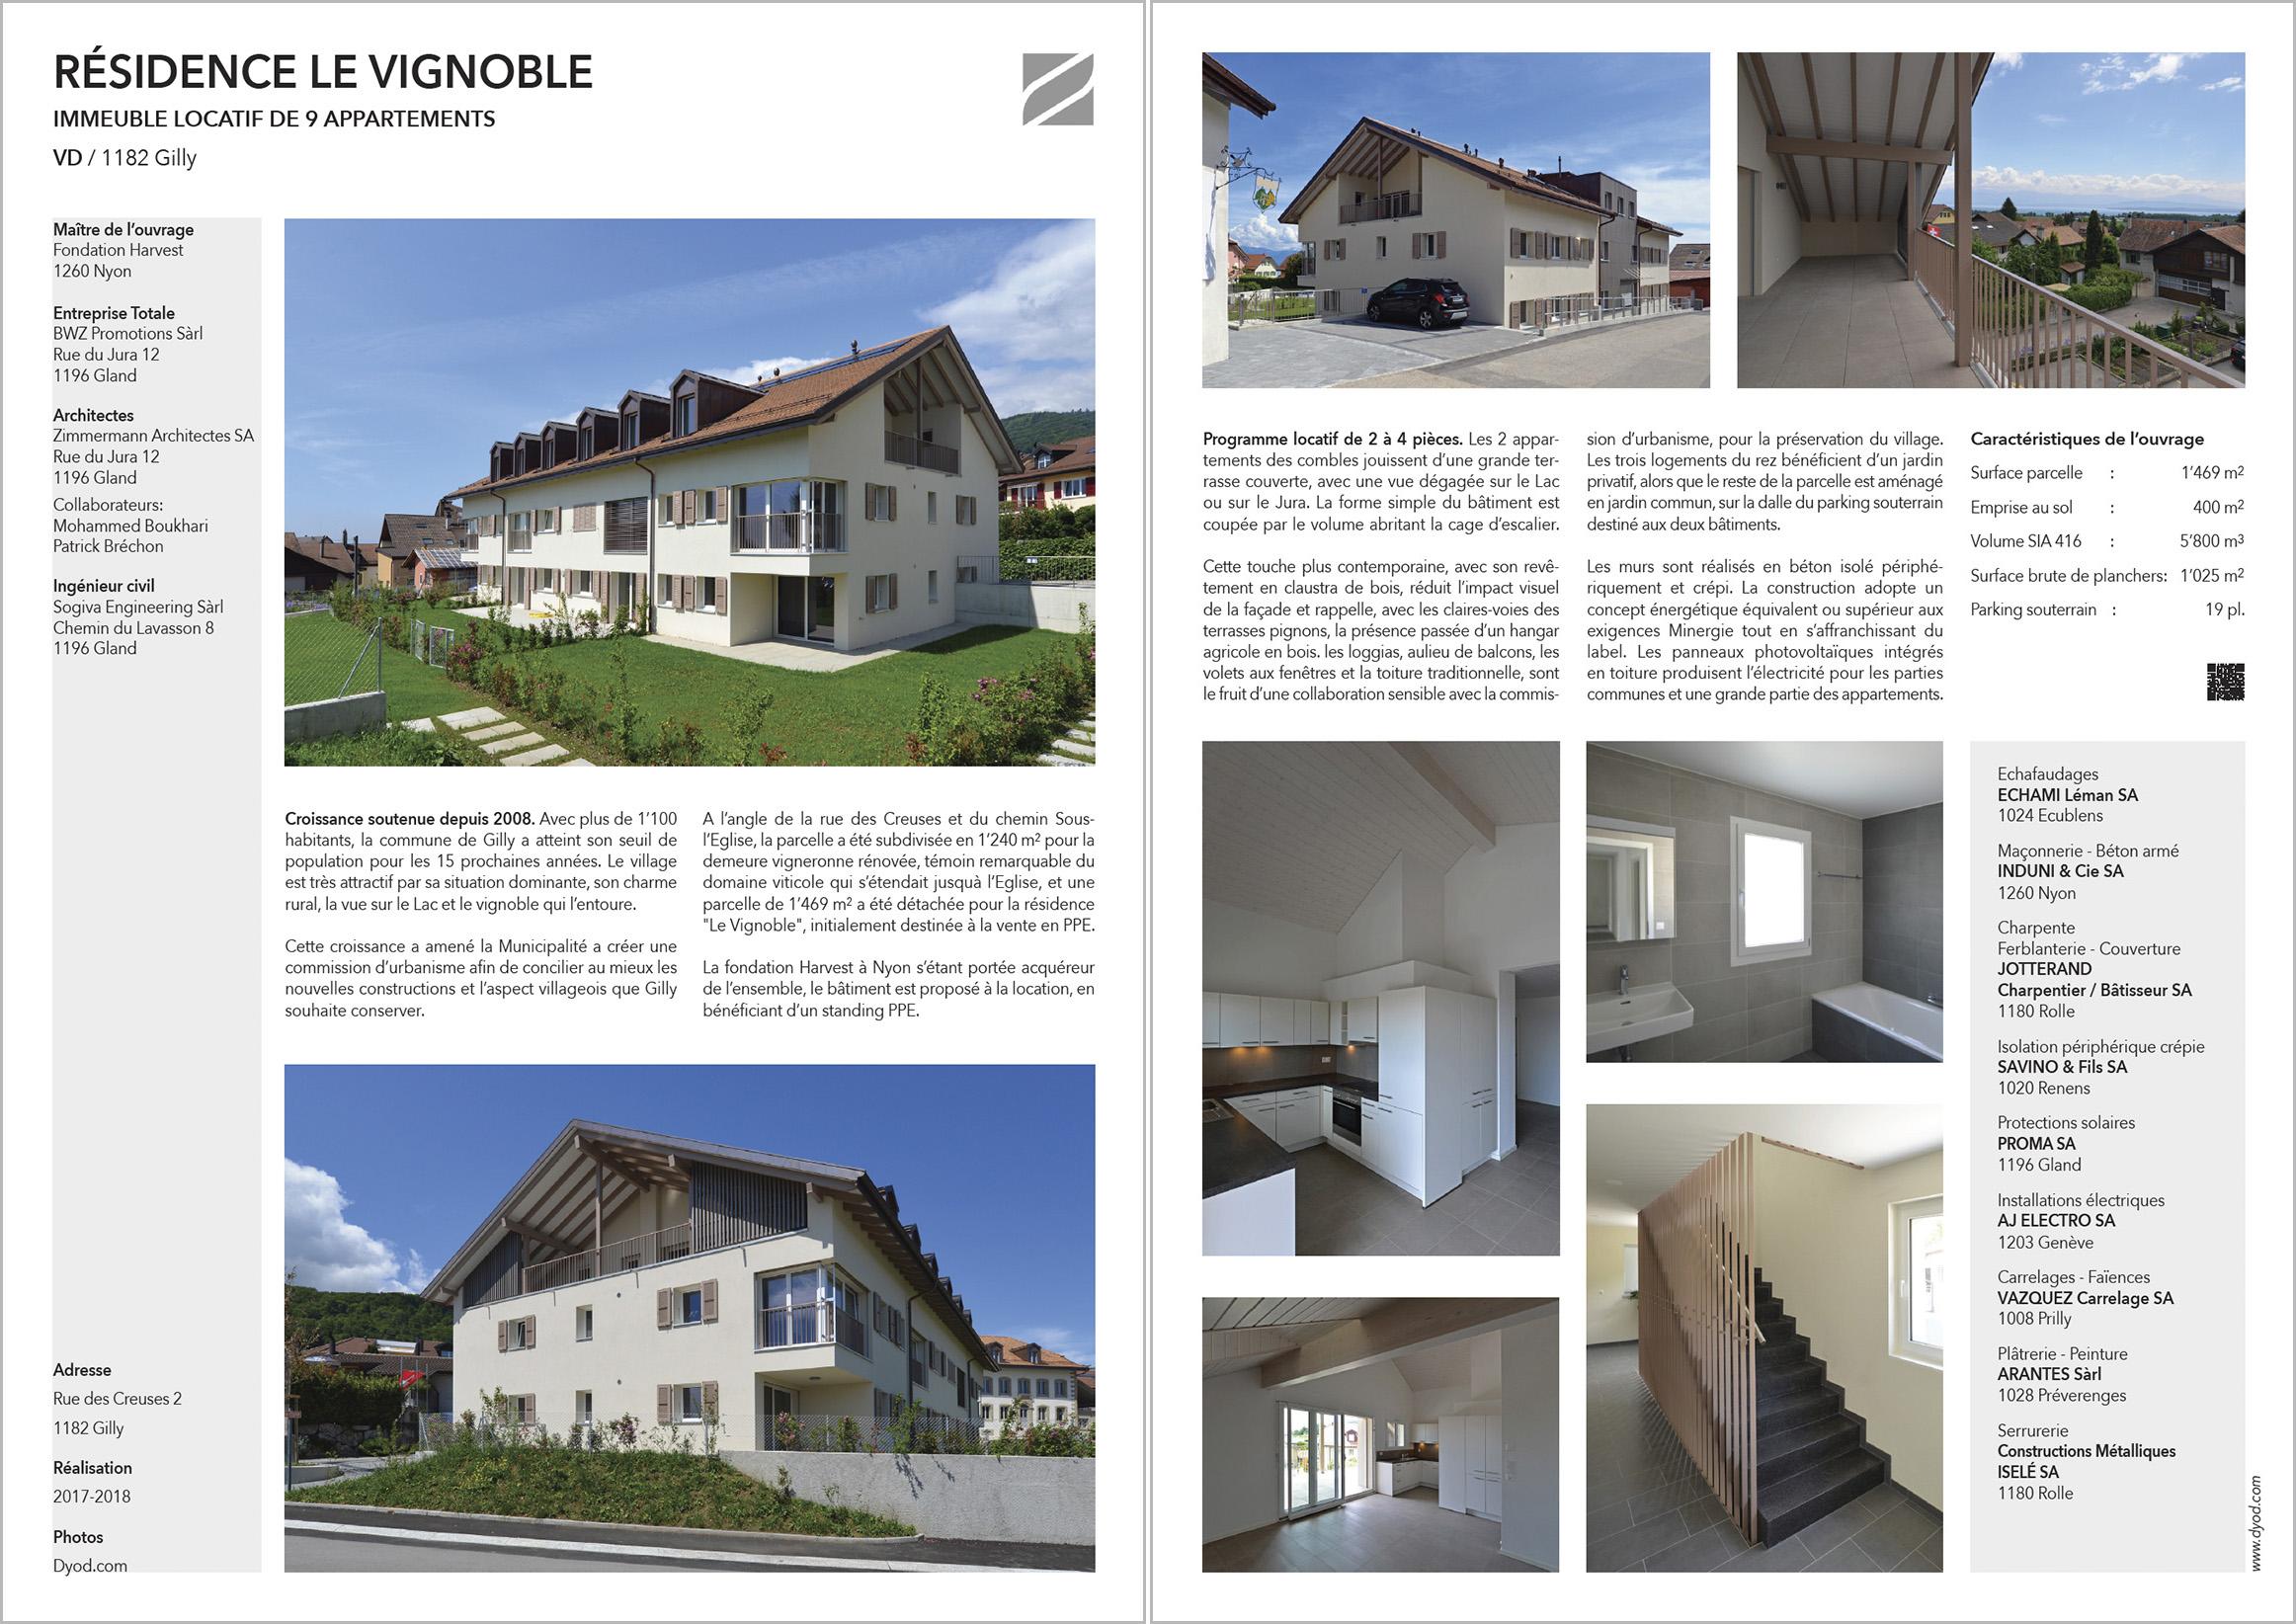 DYOD Résidence Vignoble Gilly Zimmermann Architectes